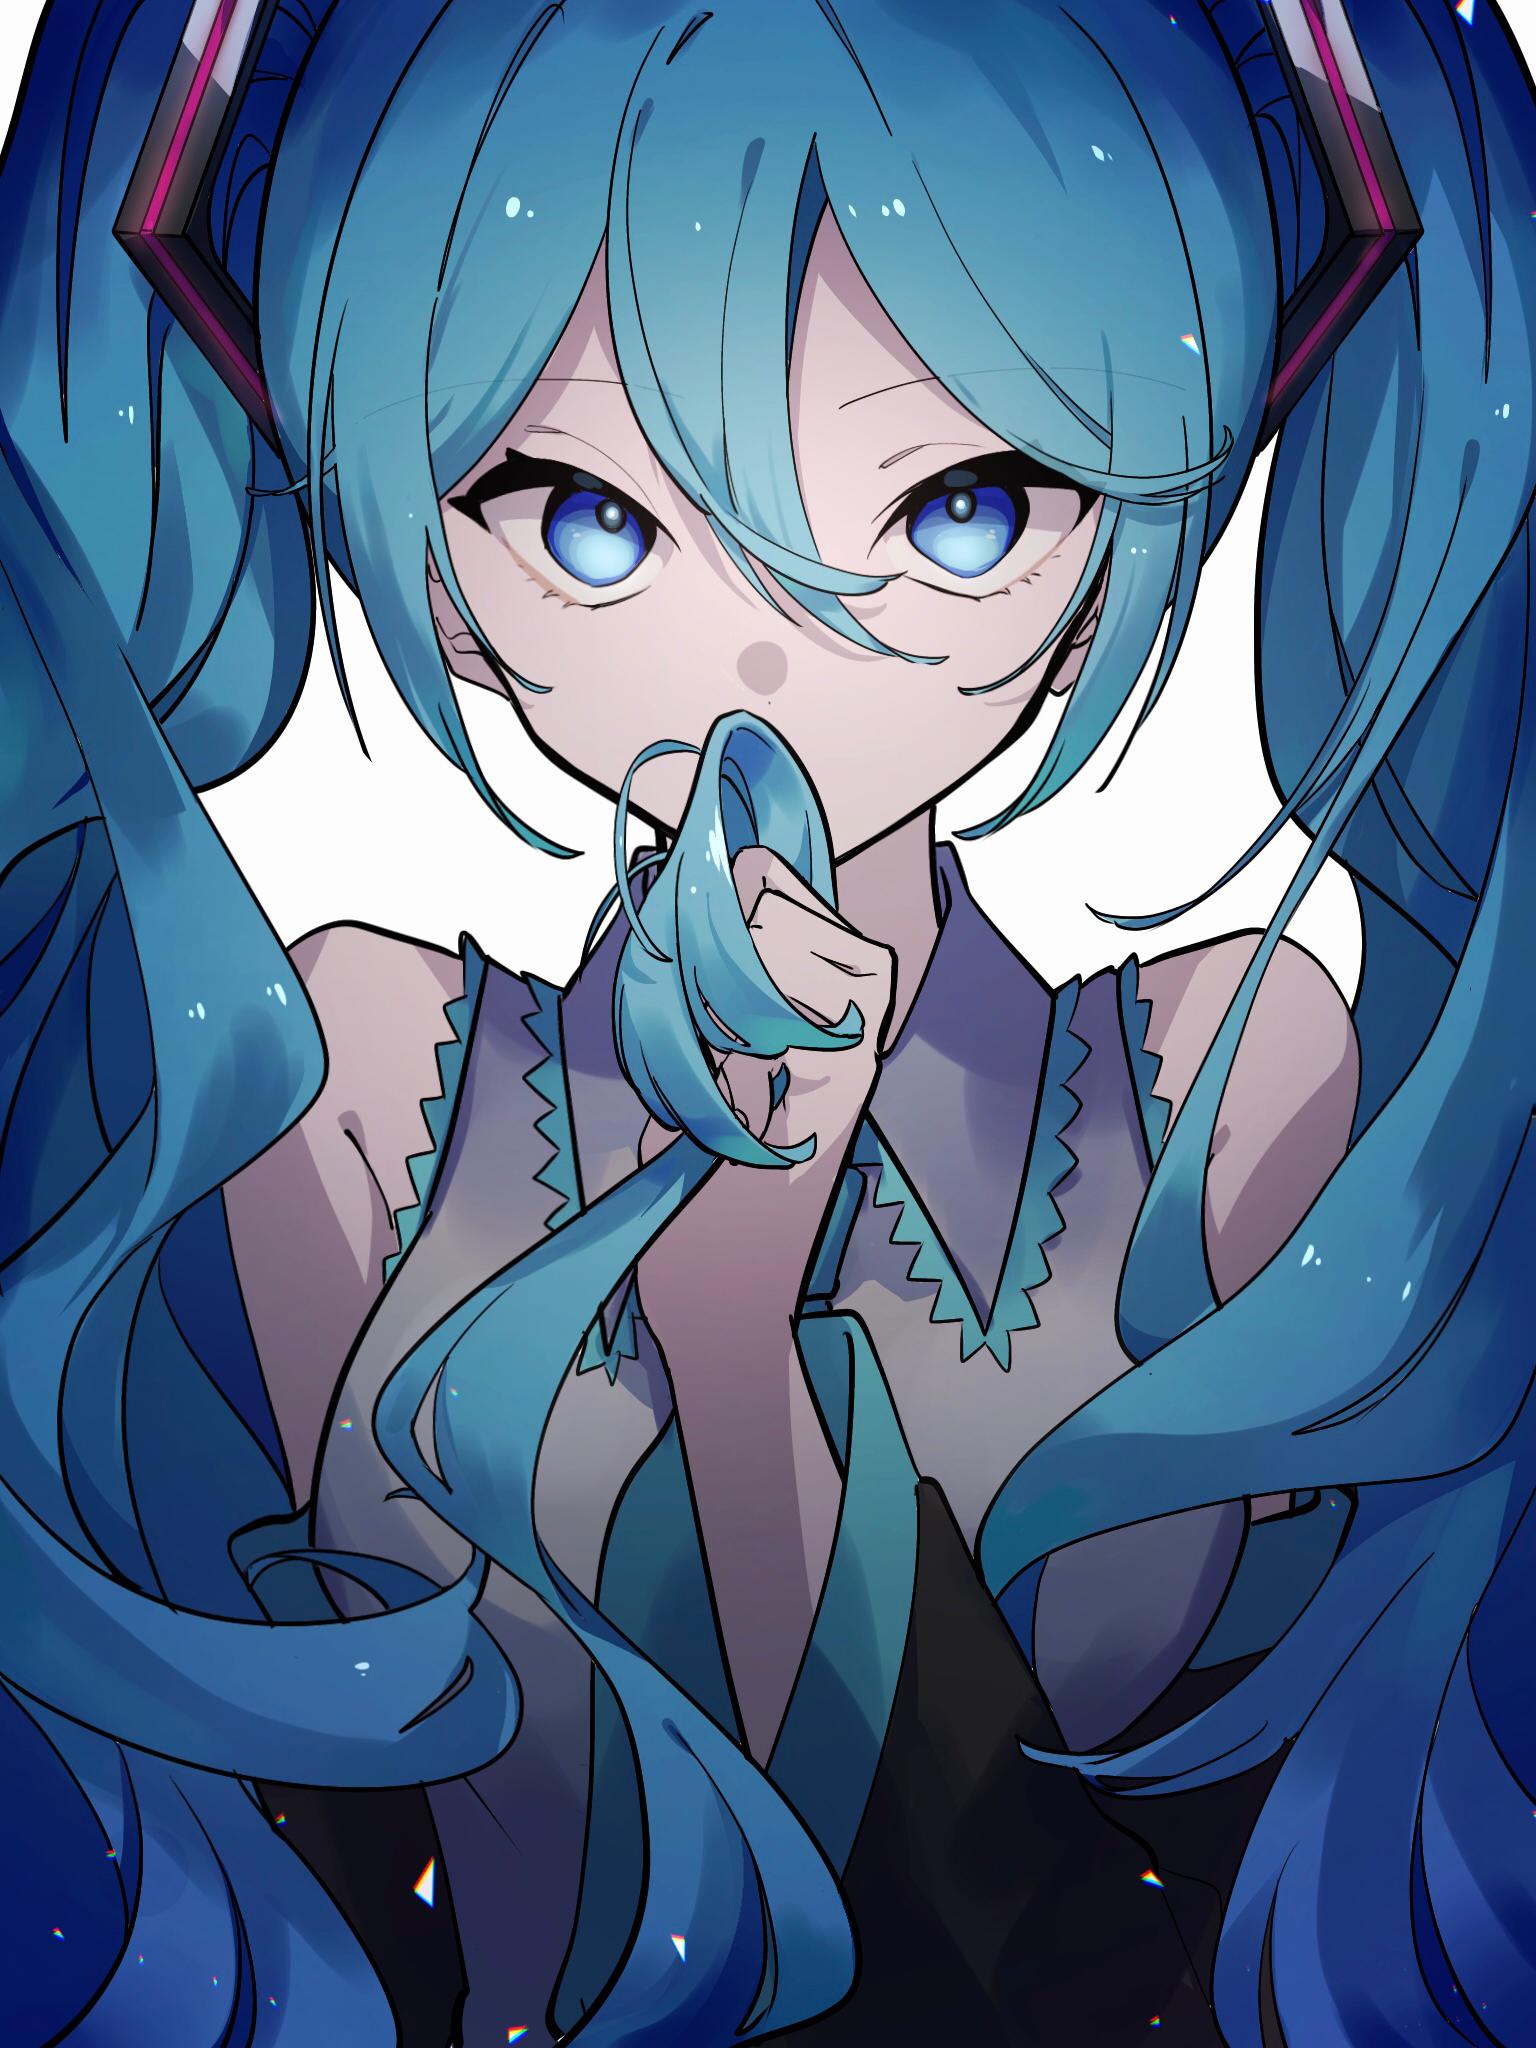 Anime Anime Girls Digital Art Artwork 2D Portrait Display Vertical Vocaloid Hatsune Miku Twintails B 1536x2048